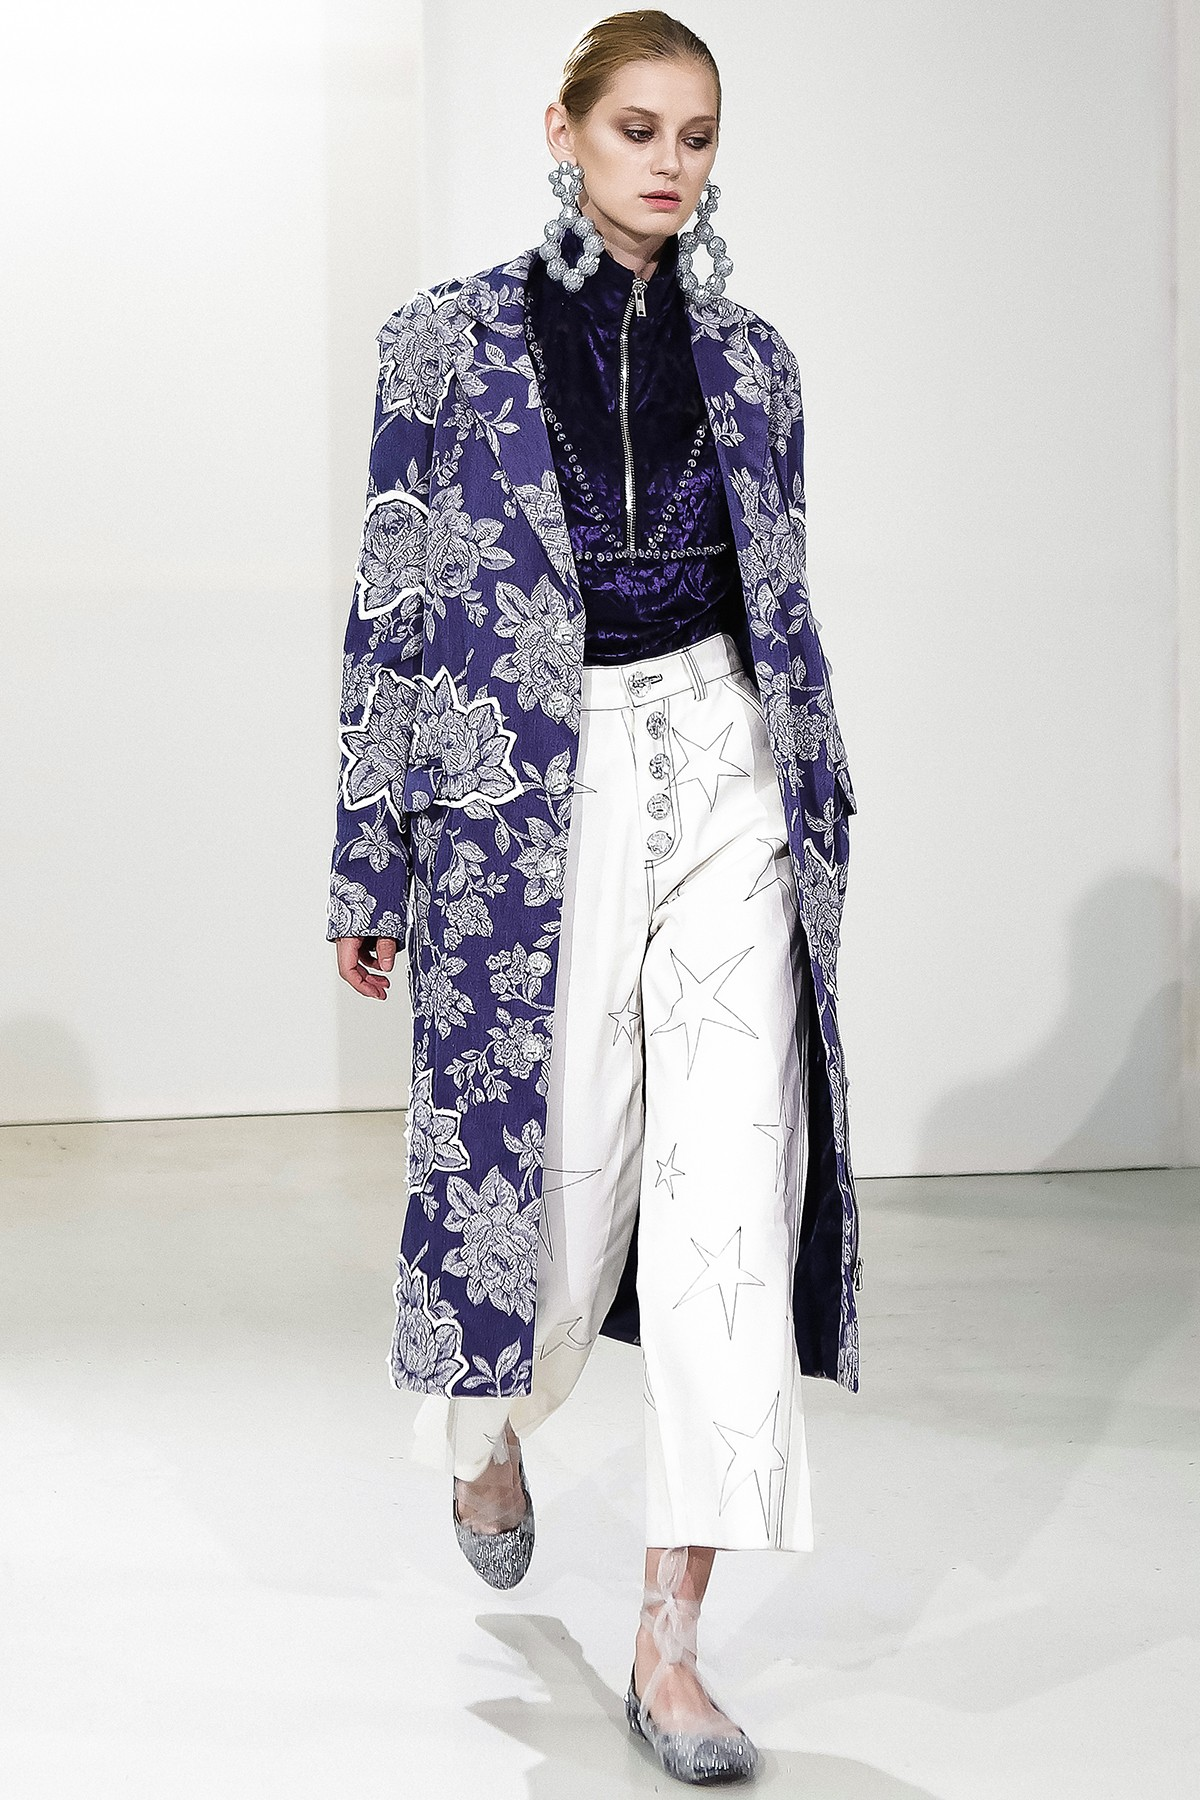 emesebako_best_romaniandesigner__fabulous_muses_fashion_icon_interview-2